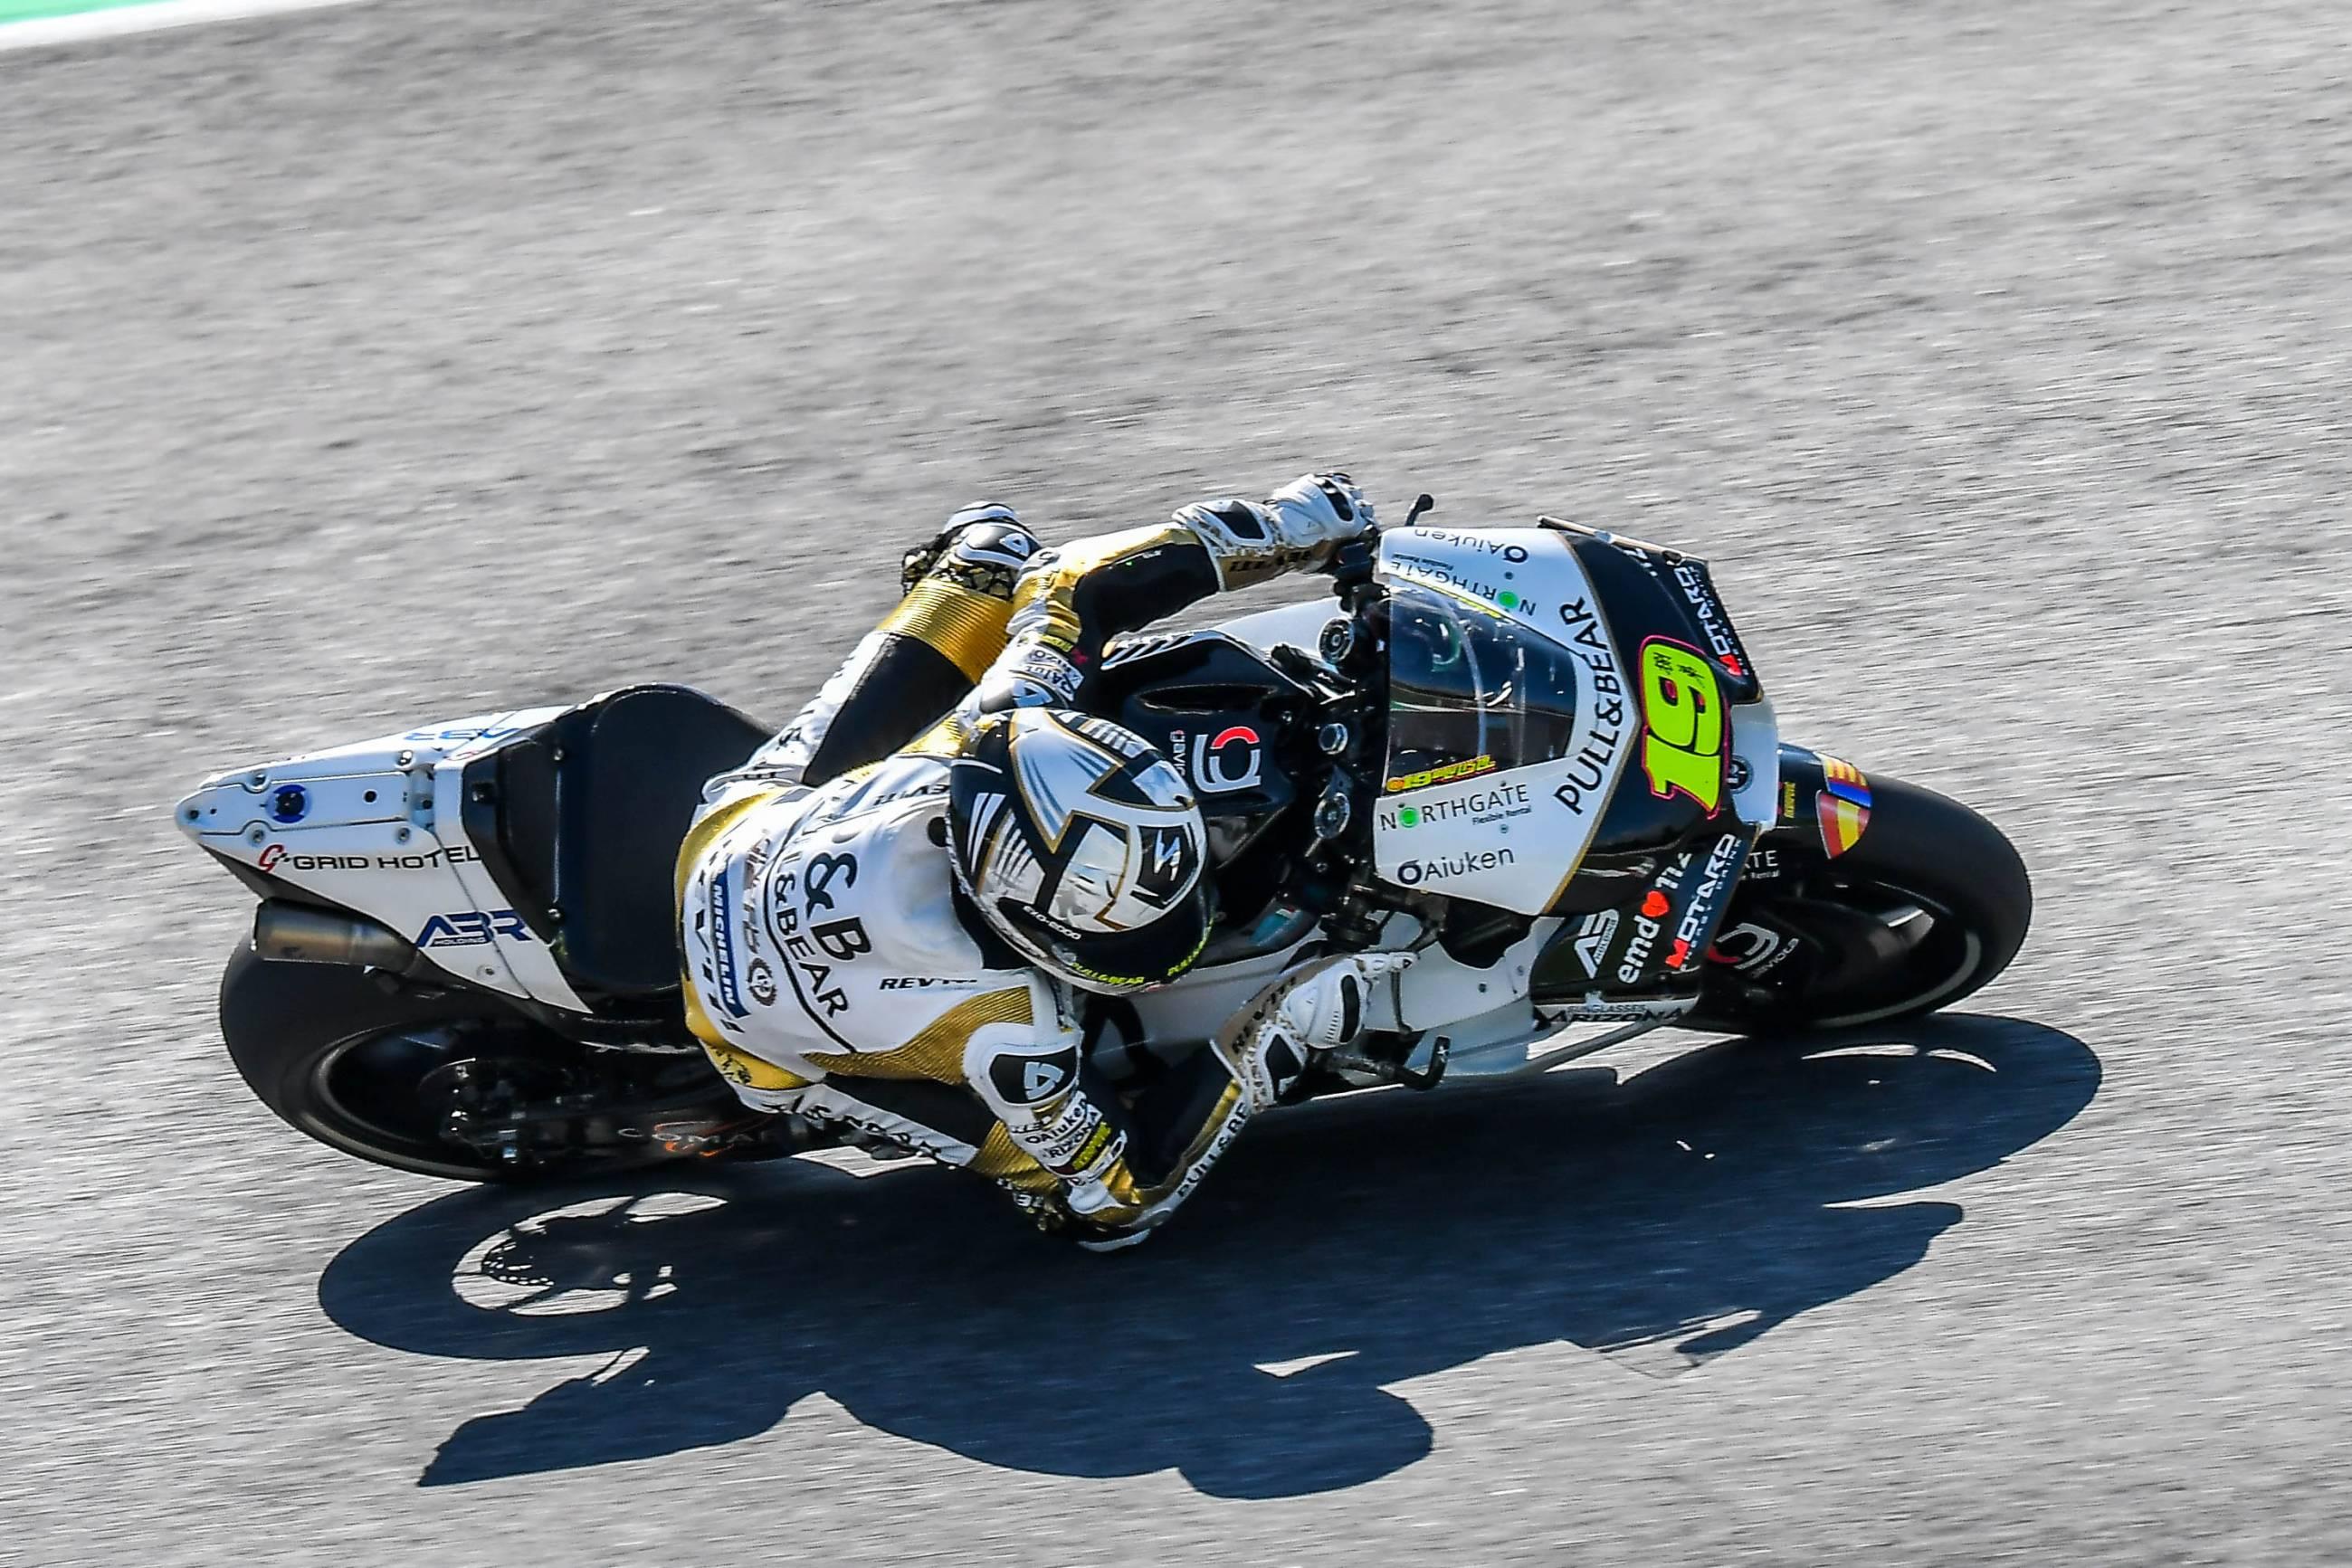 2019 Motogp Season Sees Sepang Circuit And Angel Nieto Team Partners